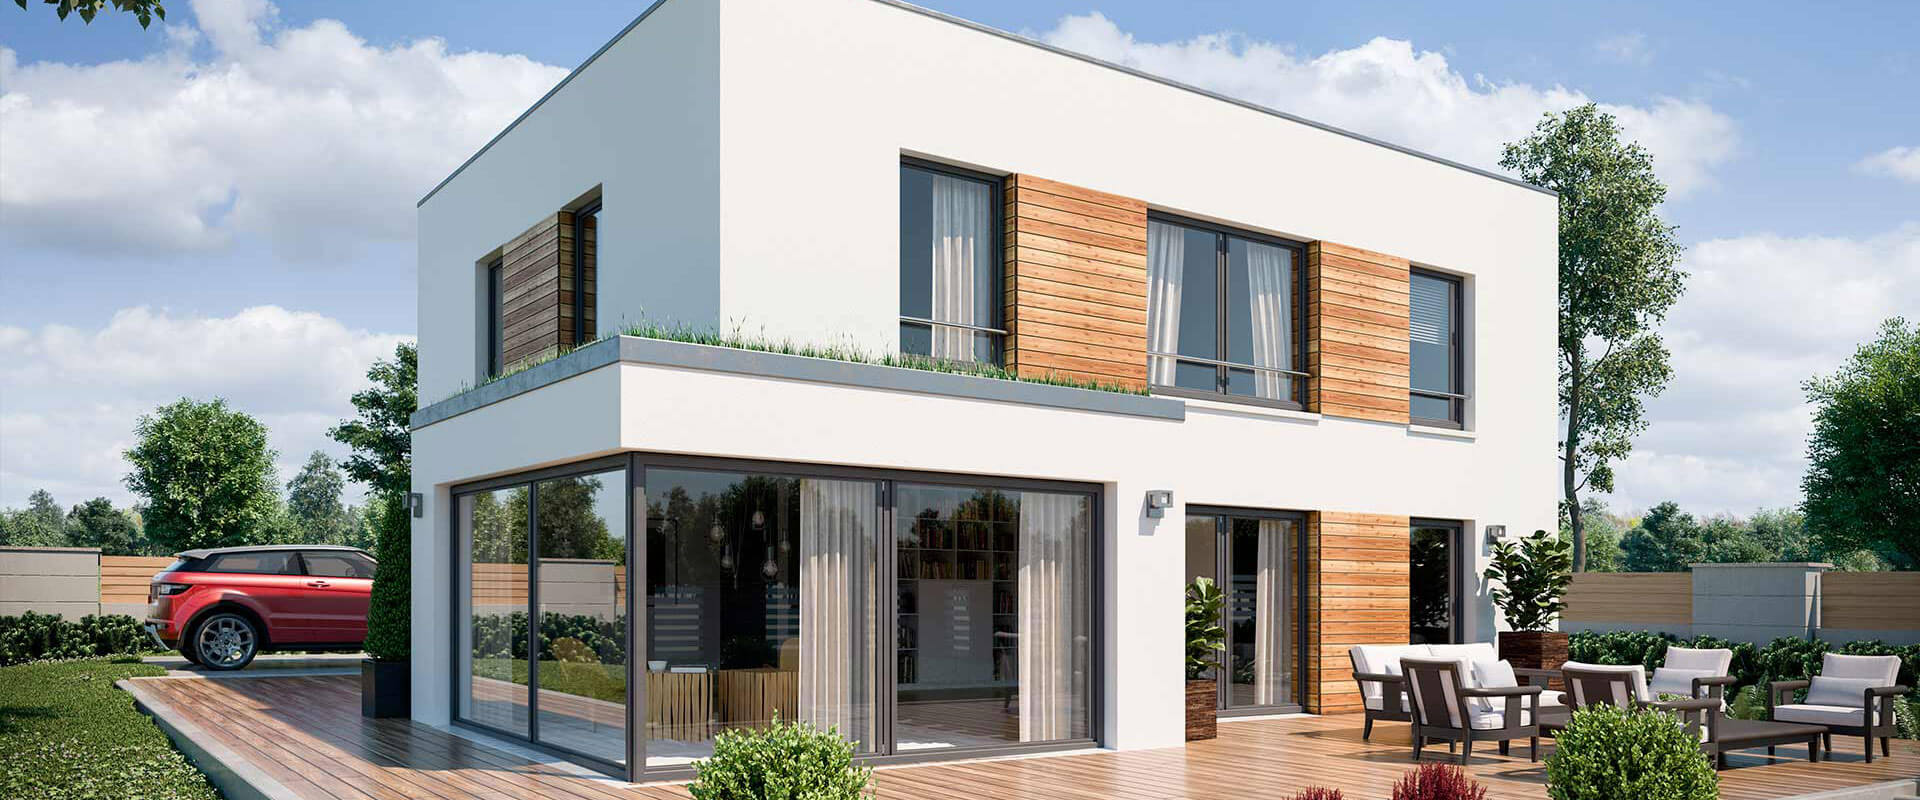 Einfamilienhaus - Vario4oplus 114